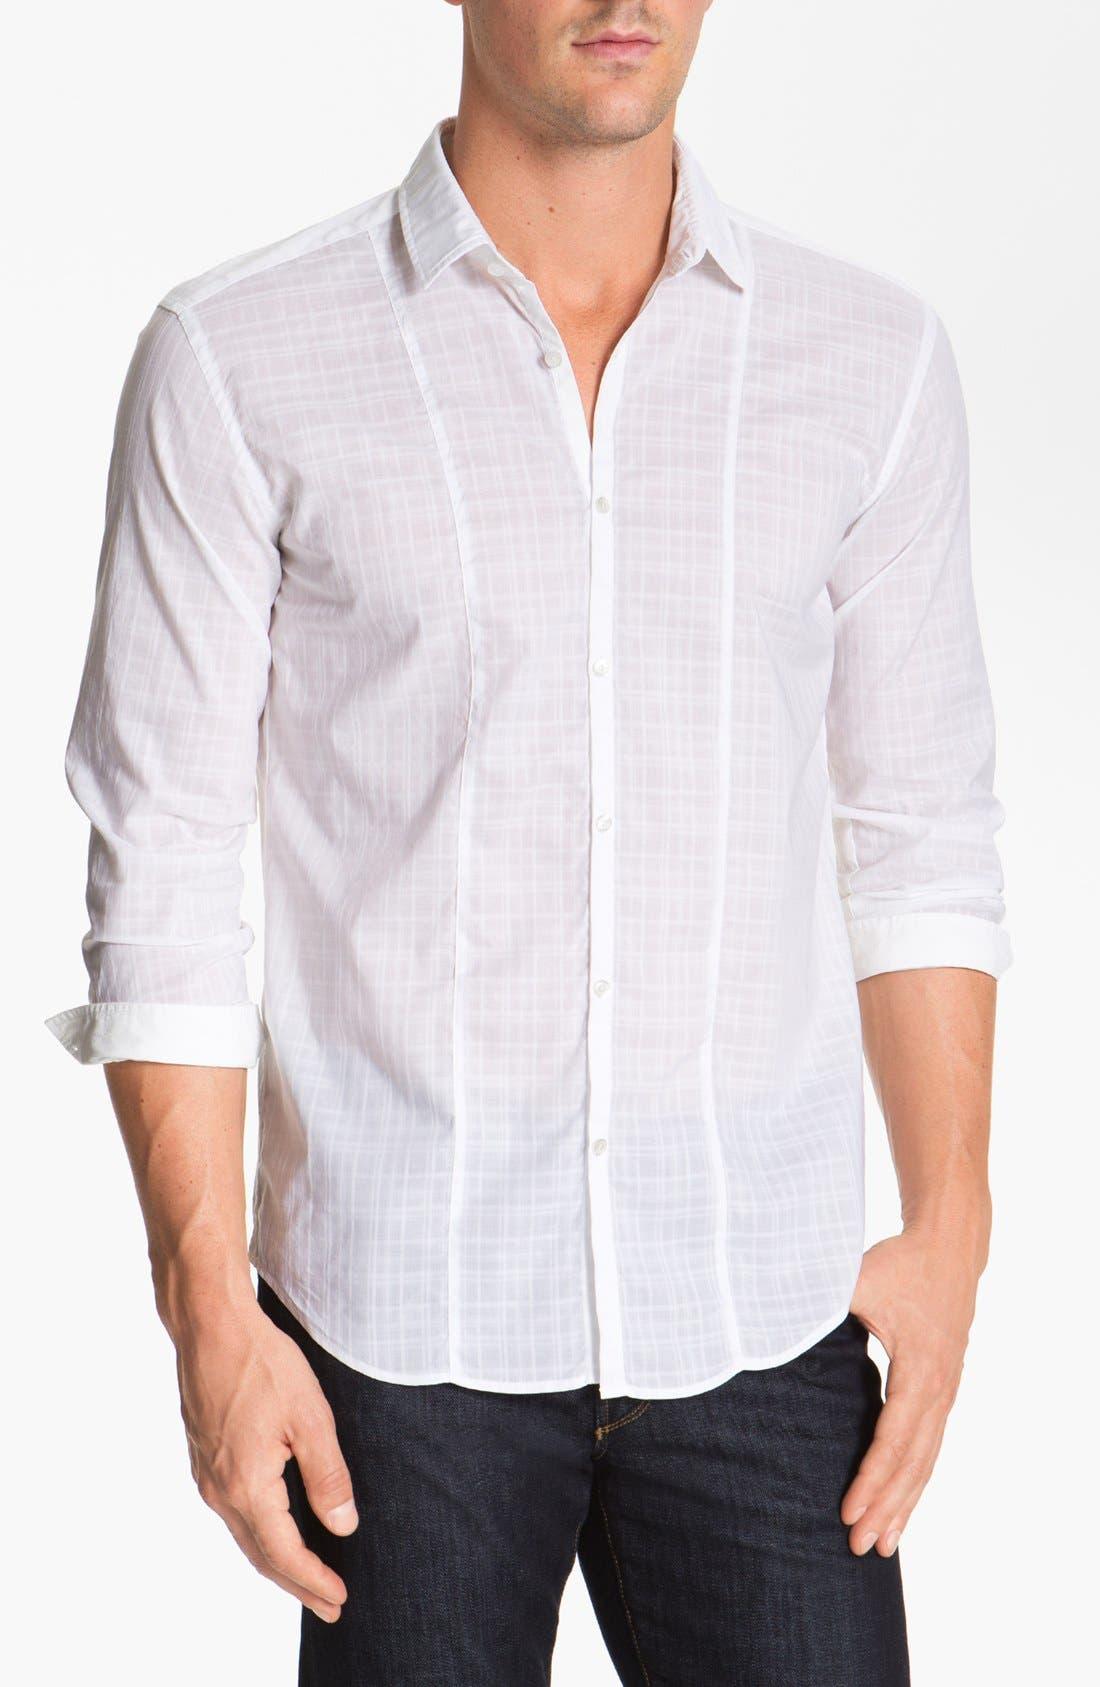 Alternate Image 1 Selected - BOSS HUGO BOSS 'Pancho' Slim Fit Sport Shirt